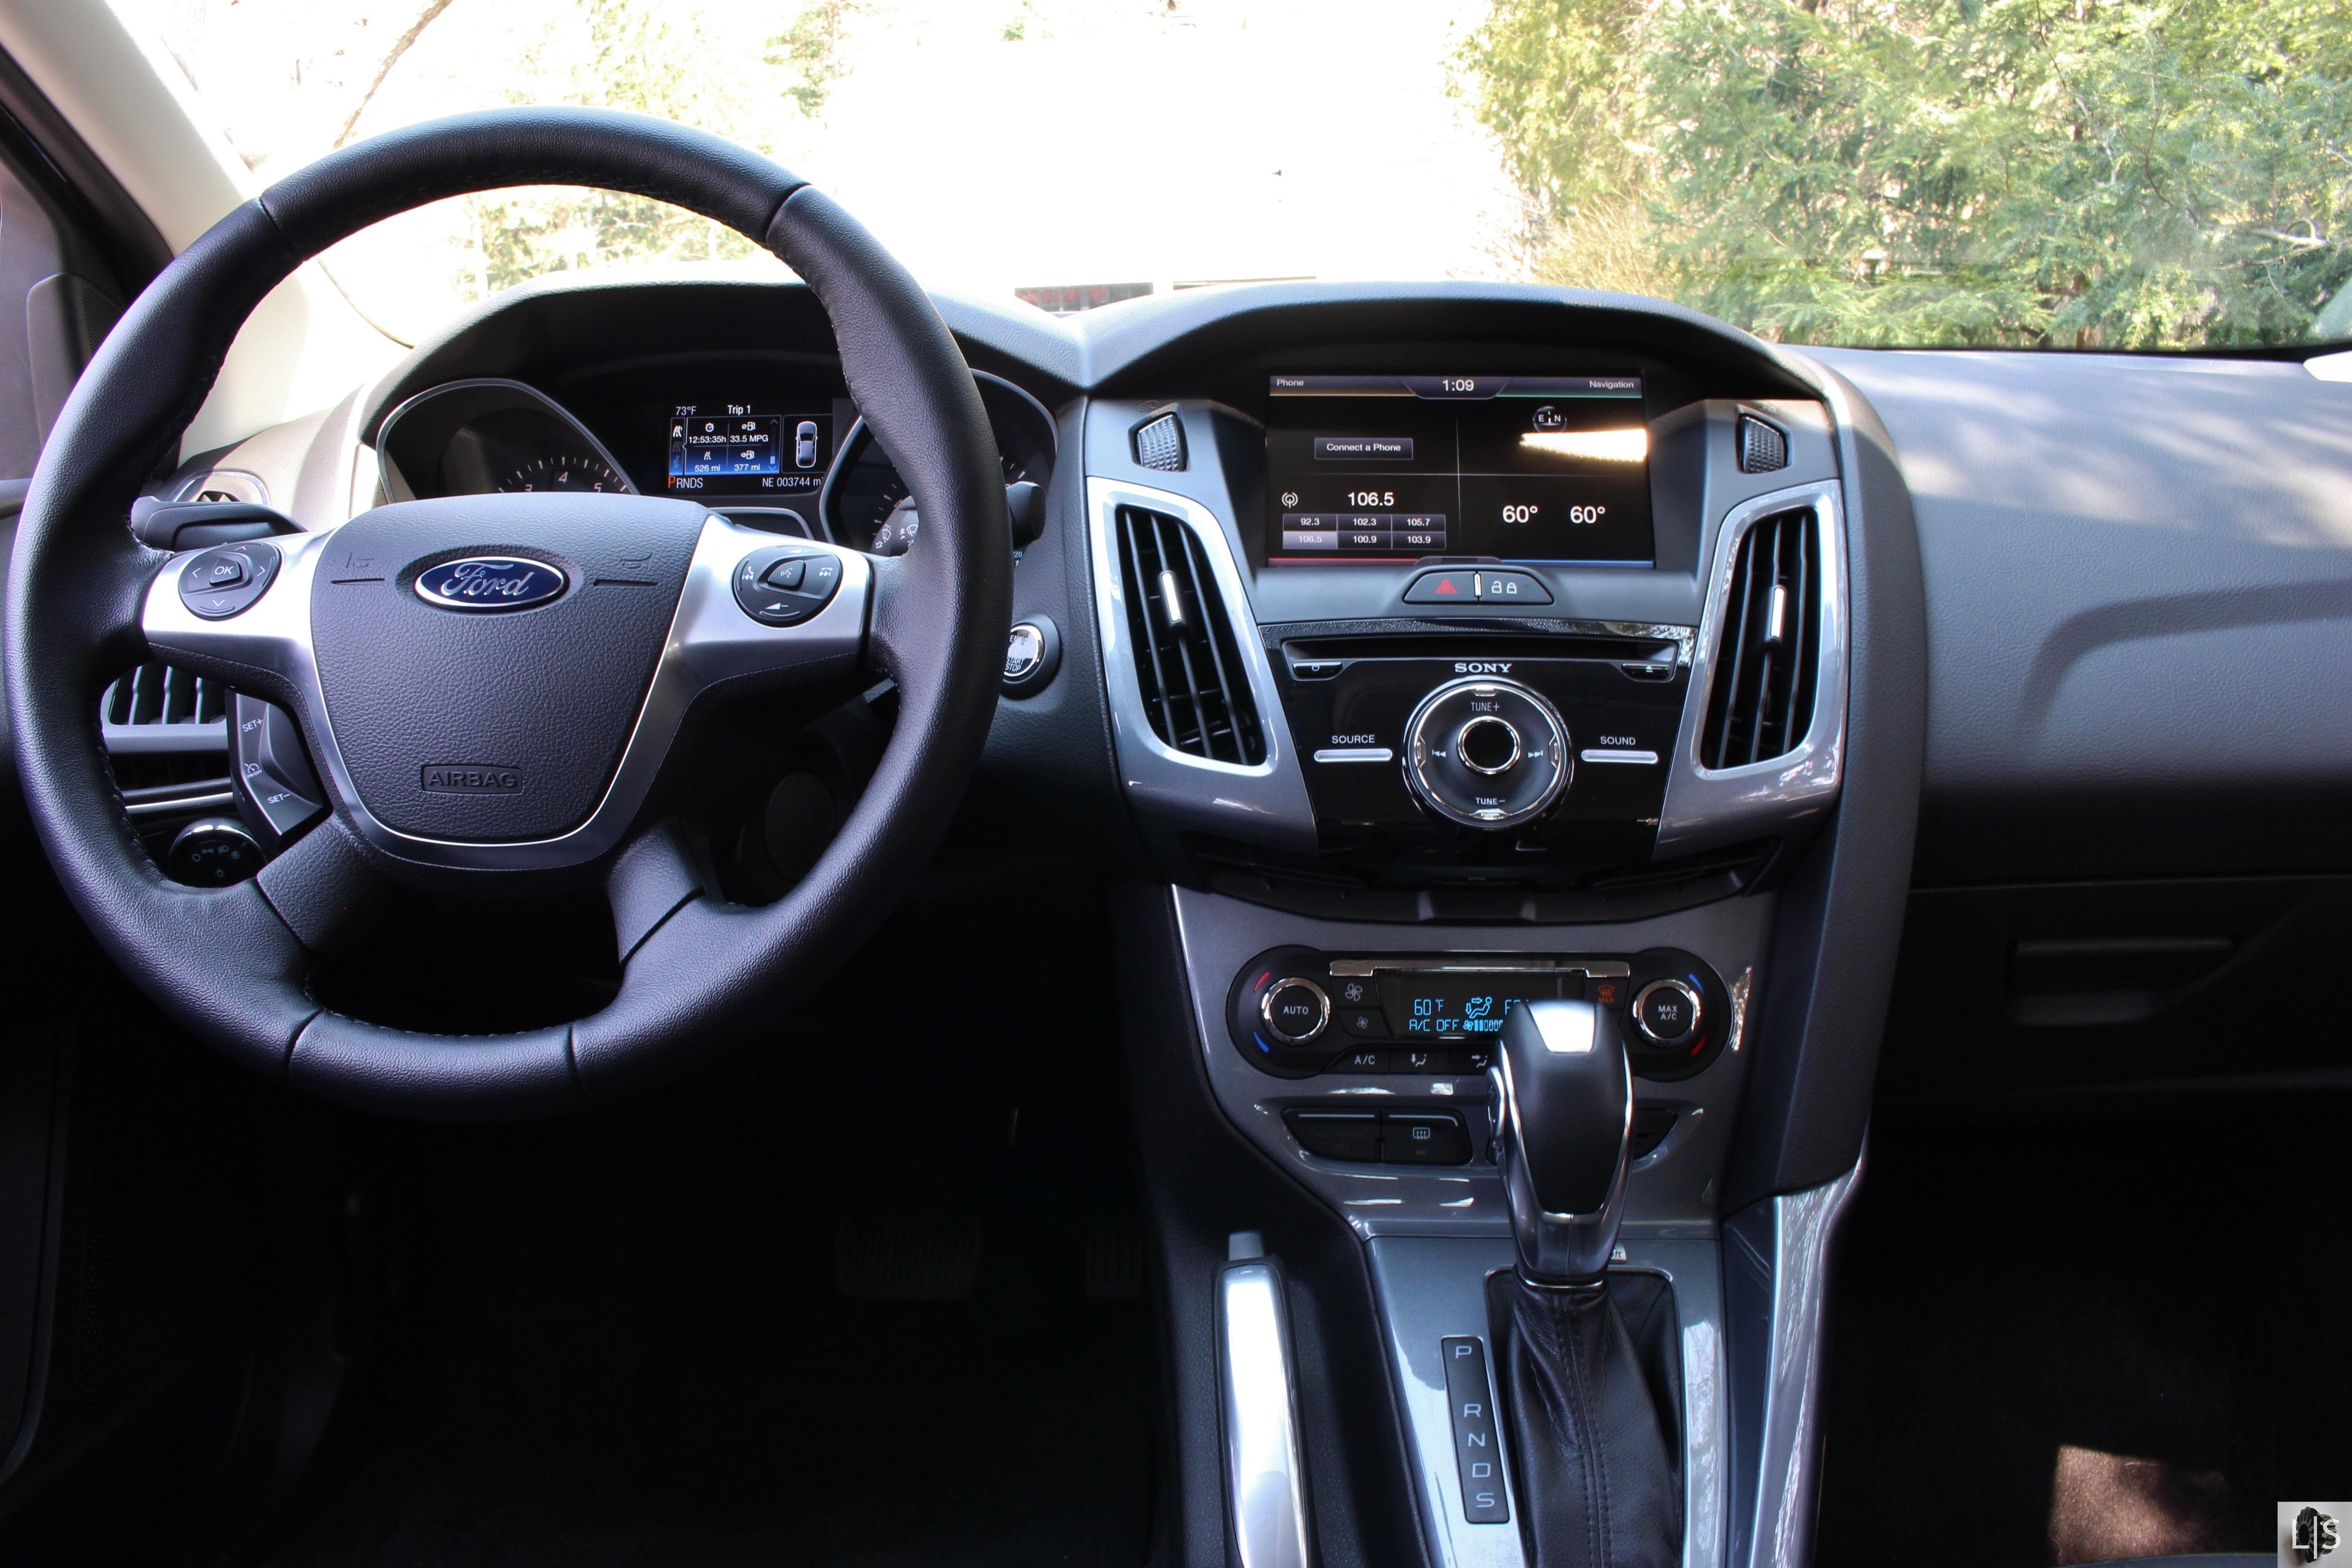 Compact Titan 2014 Ford Focus Limited Slip Blog